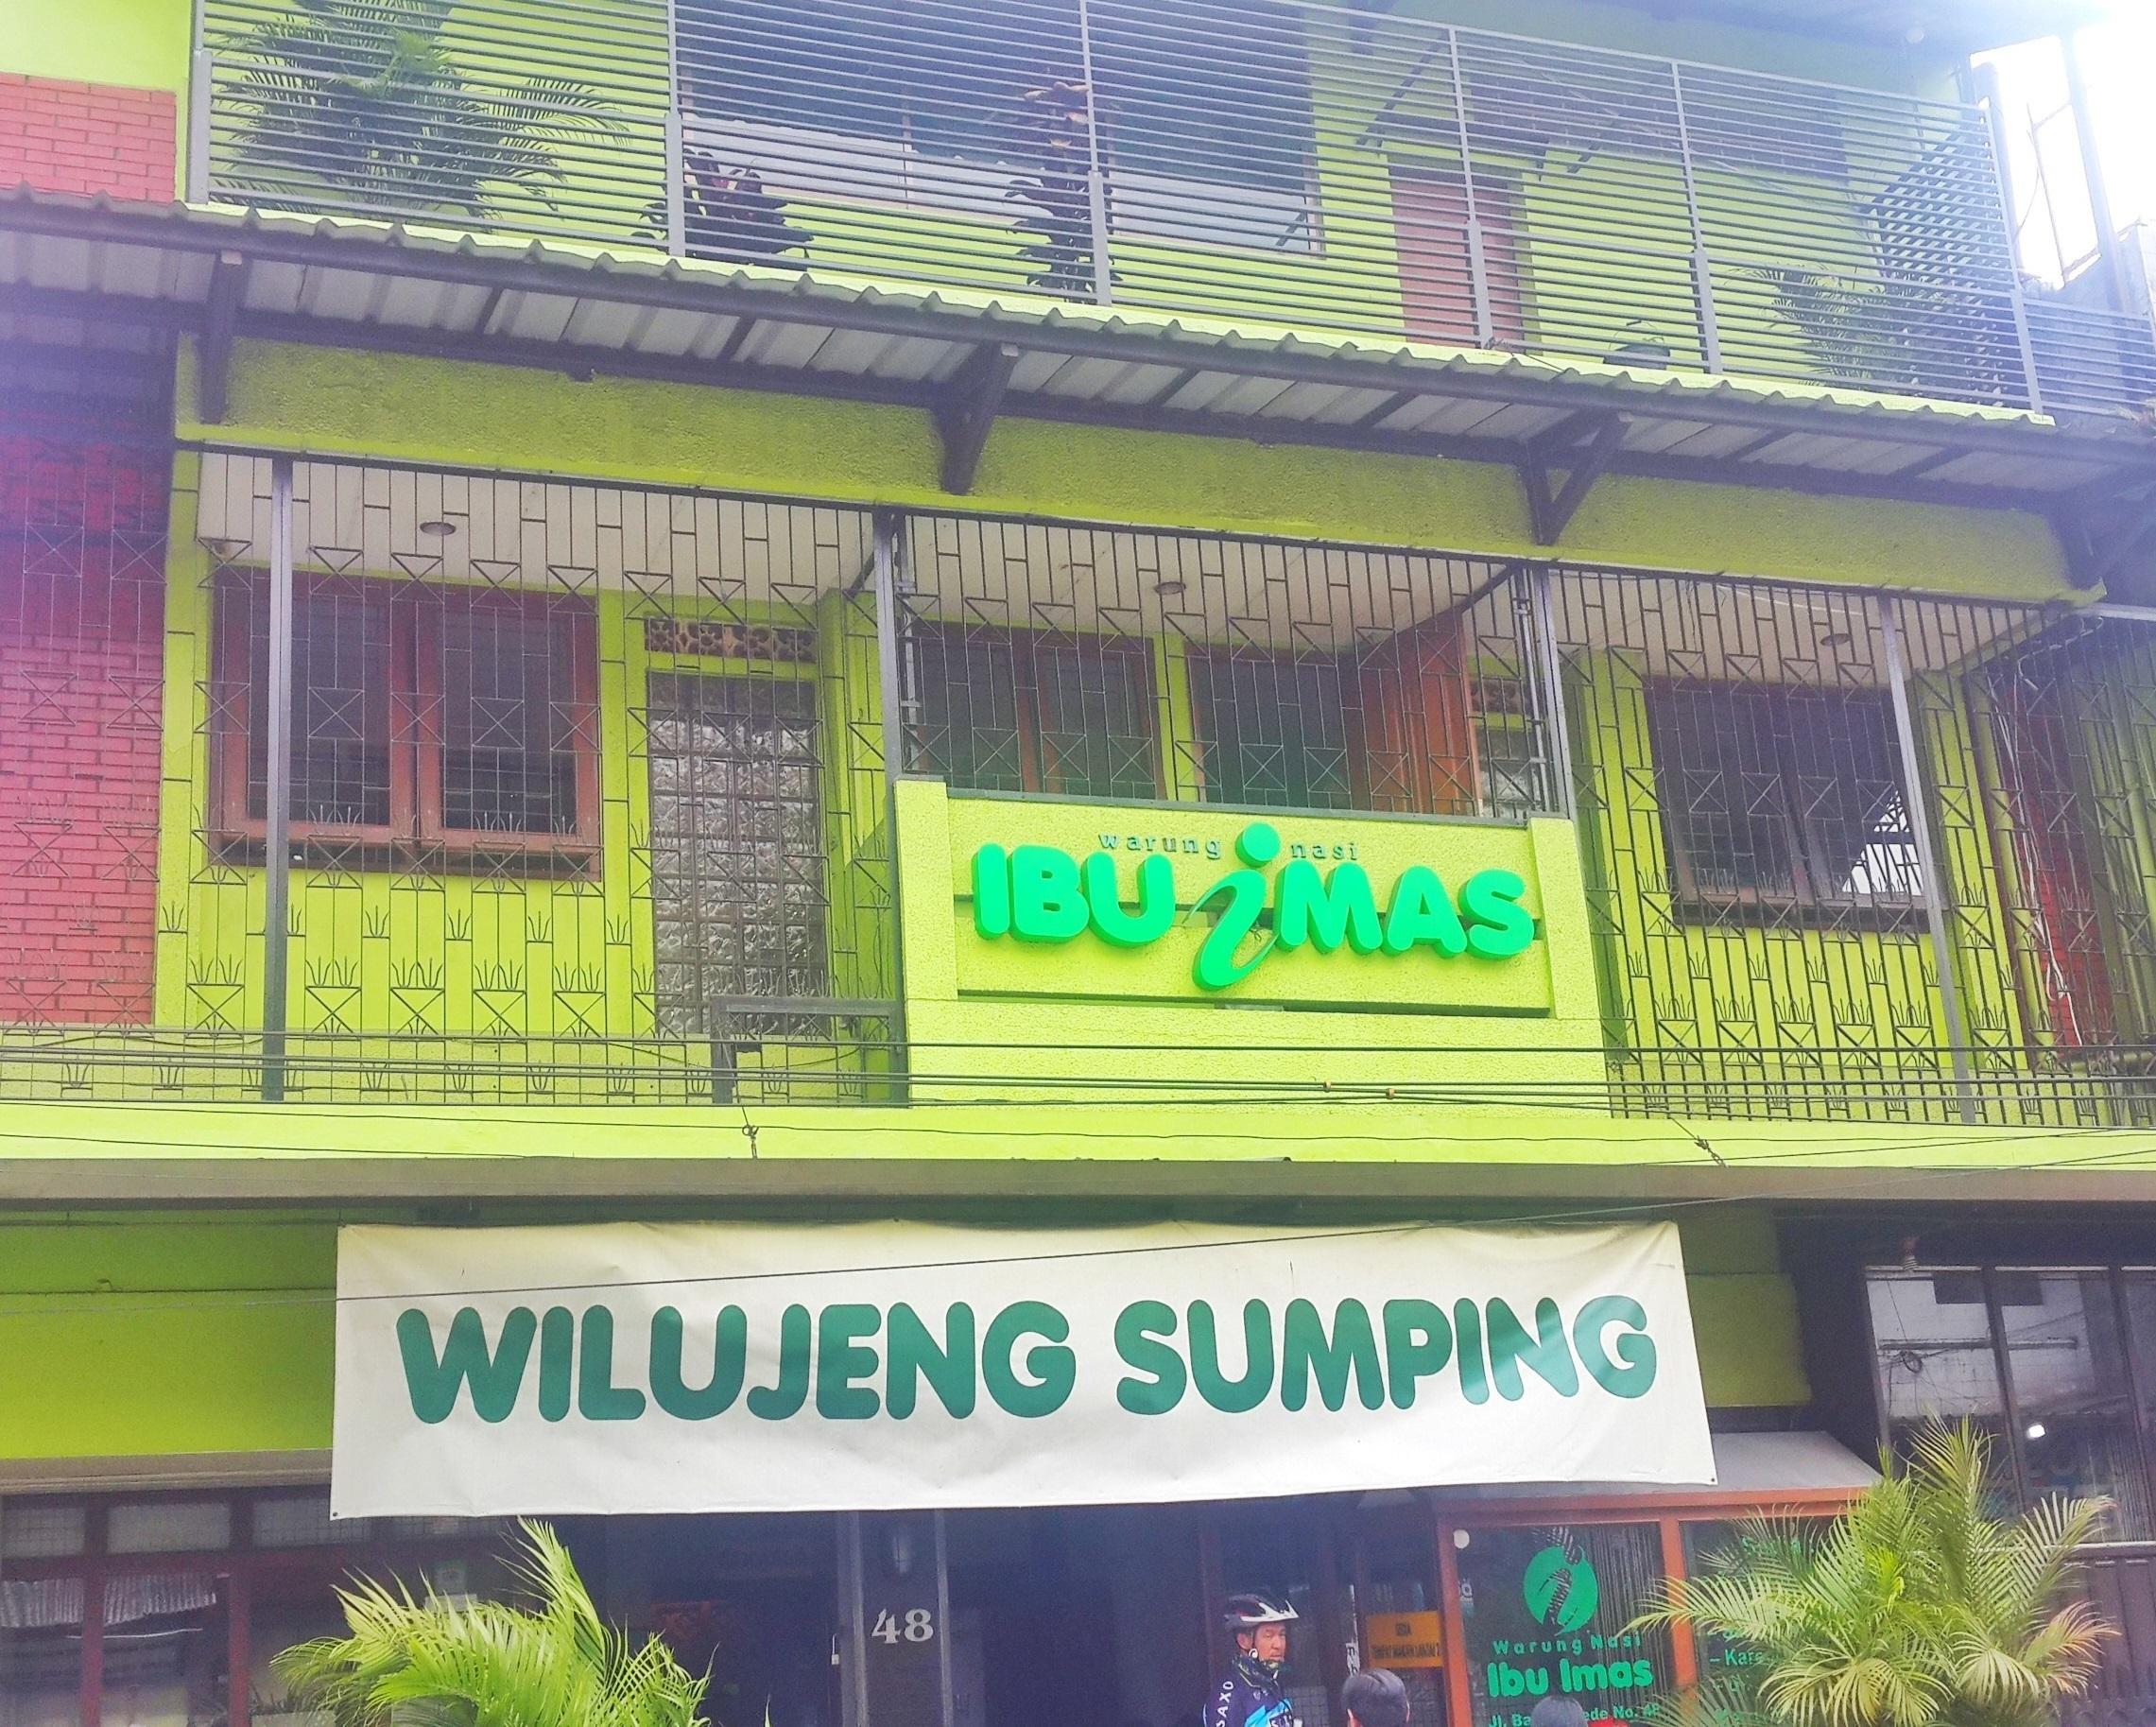 Warung Nasi Ibu Imas, Balonggede, Bandung - Lengkap: Menu terbaru, jam buka  & no telepon, alamat dengan peta